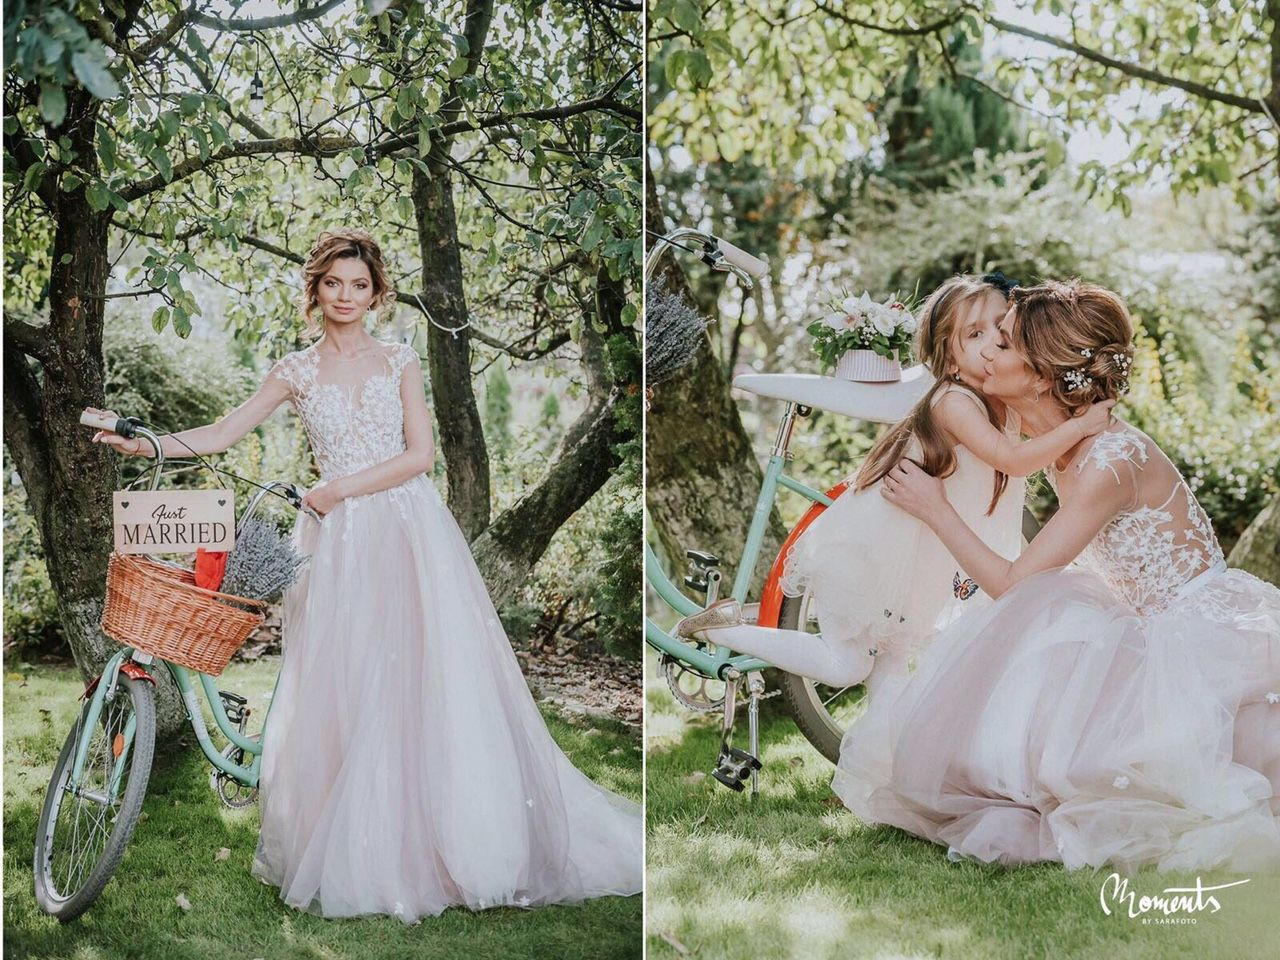 Lovely bride Andreea wearing our Rose Dress. #OtiliaBrailoiuAtelier #weddingdress